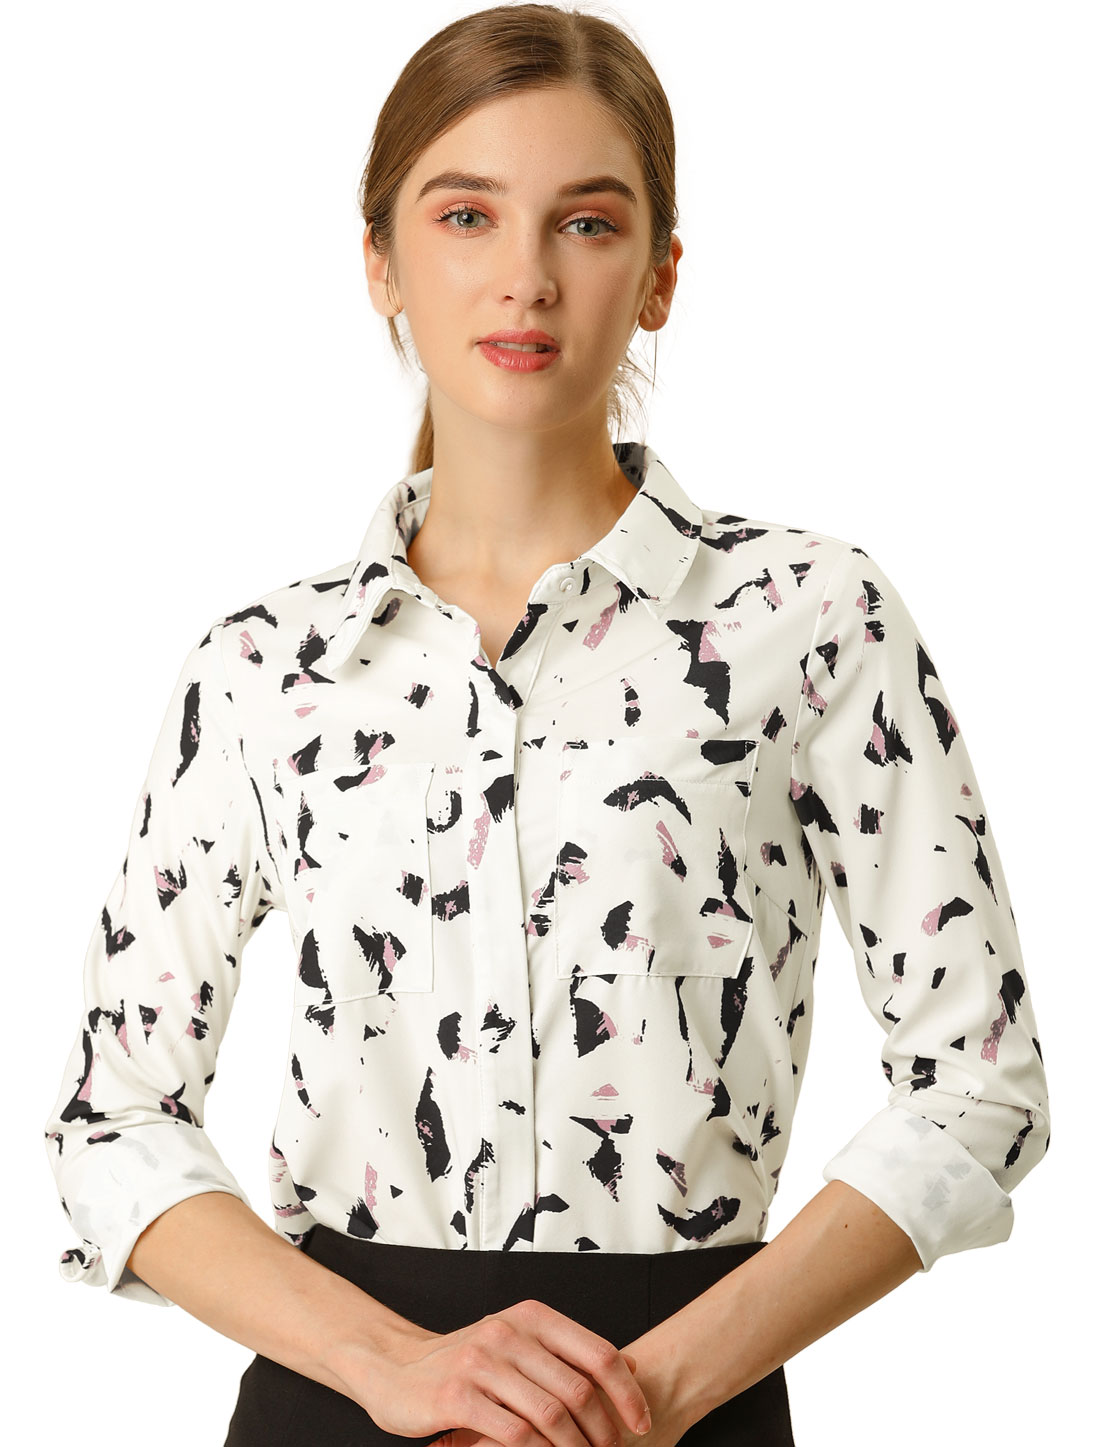 Allegra K Women's Button Down Long Sleeves Floral Shirt Cream White L